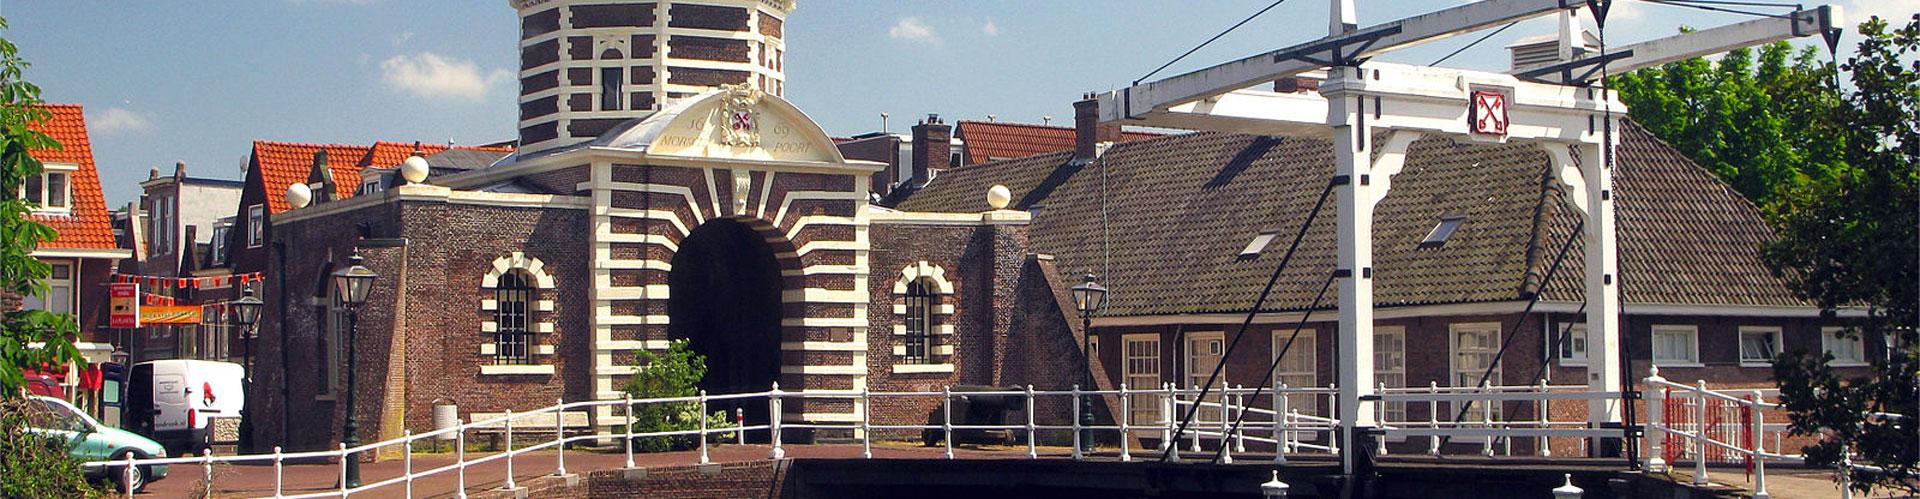 Letselschade Leiden advocaat inschakelen